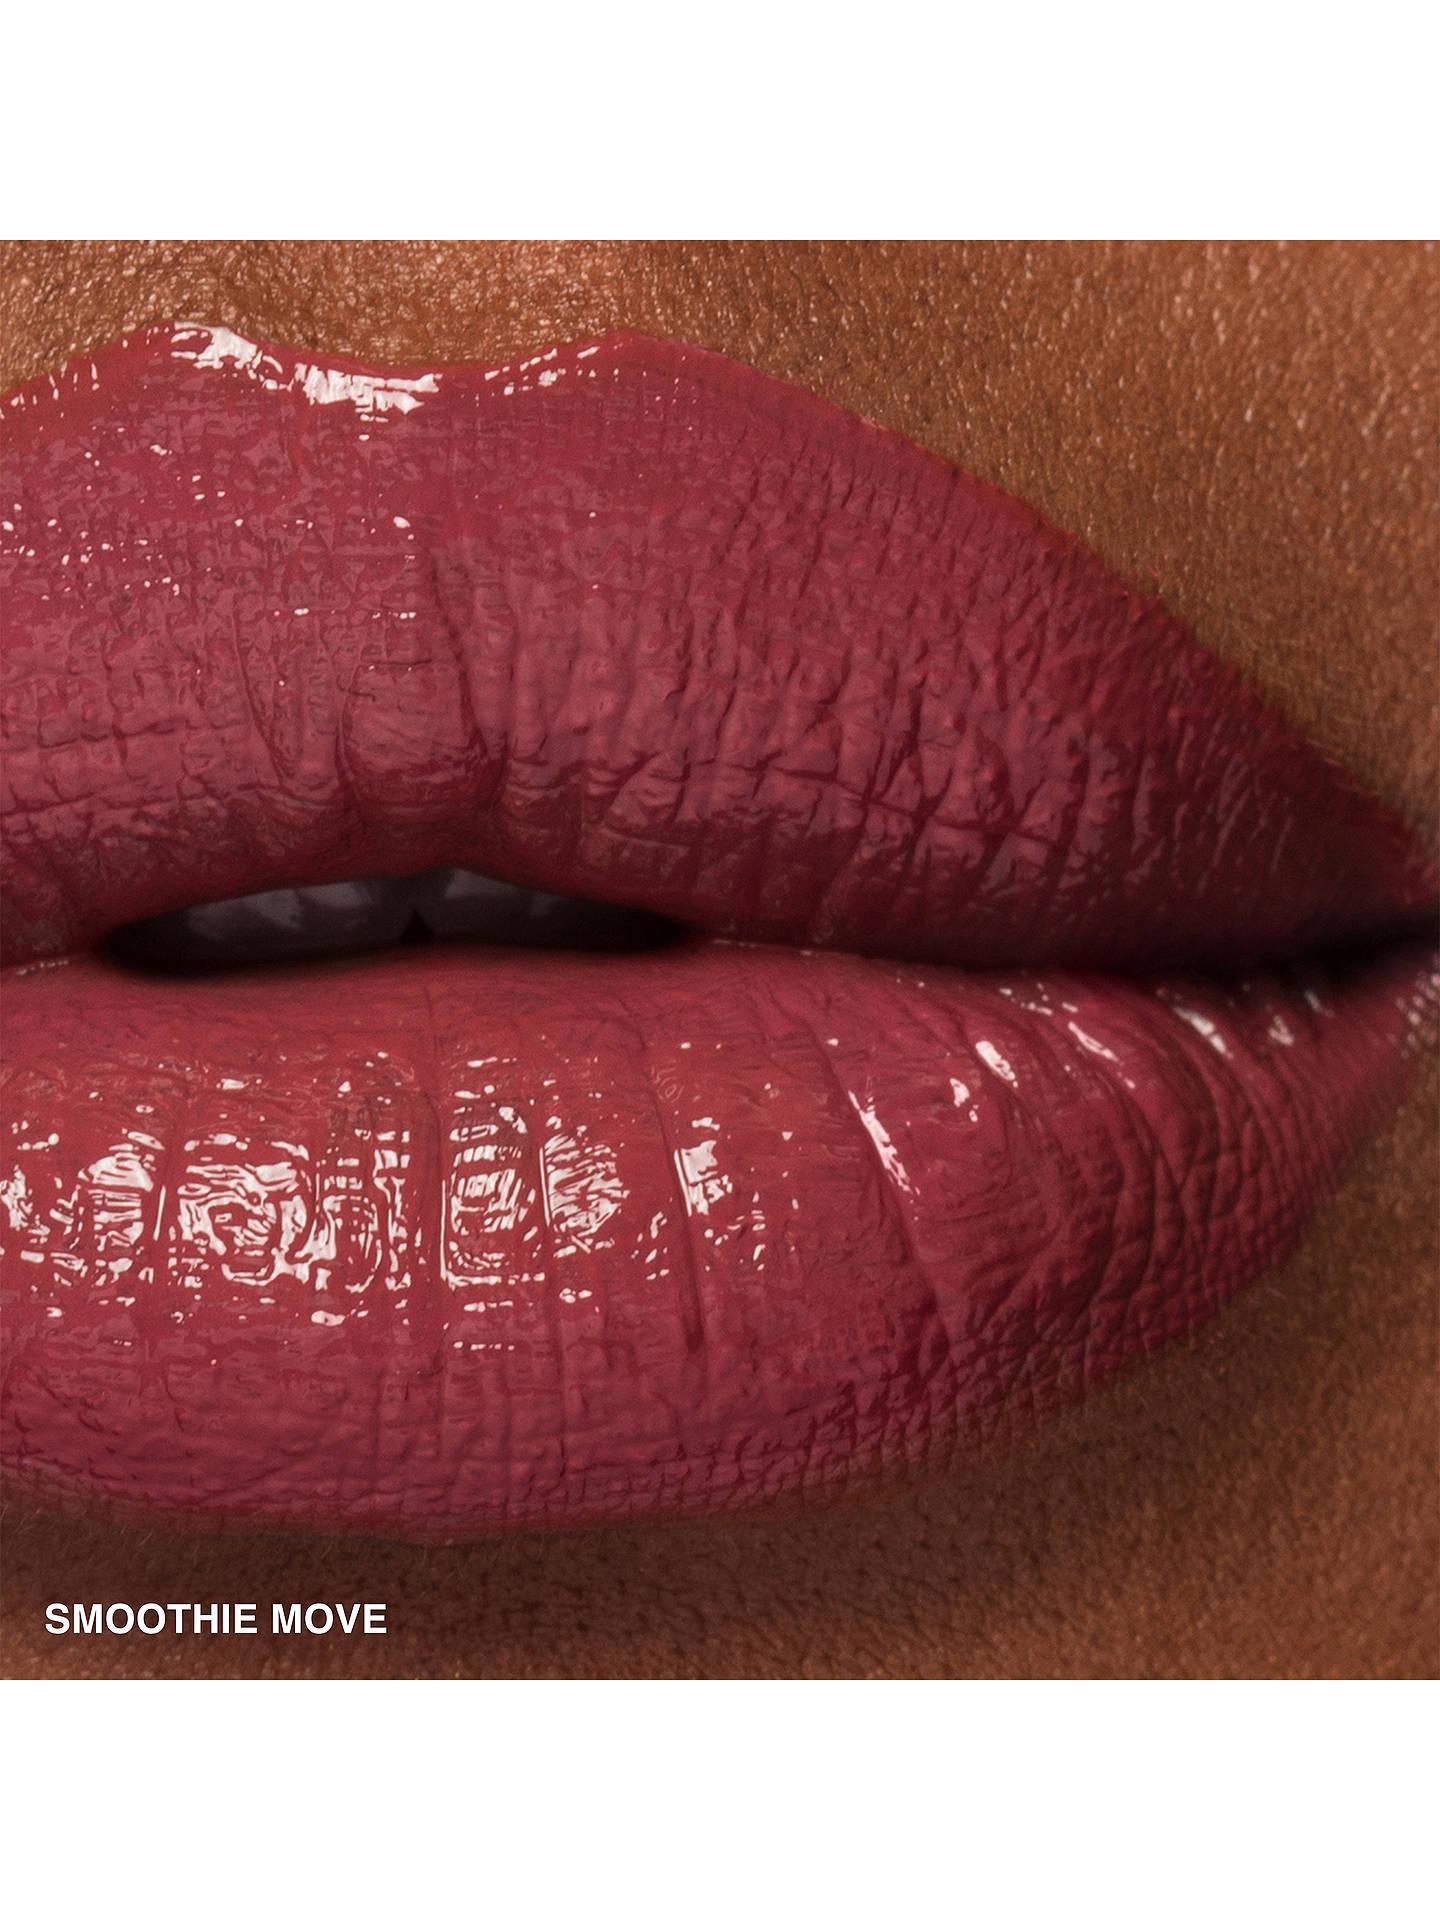 420ea2ff2947 ... Buy Bobbi Brown Crushed Liquid Lipstick, Smoothie Move Online at  johnlewis.com